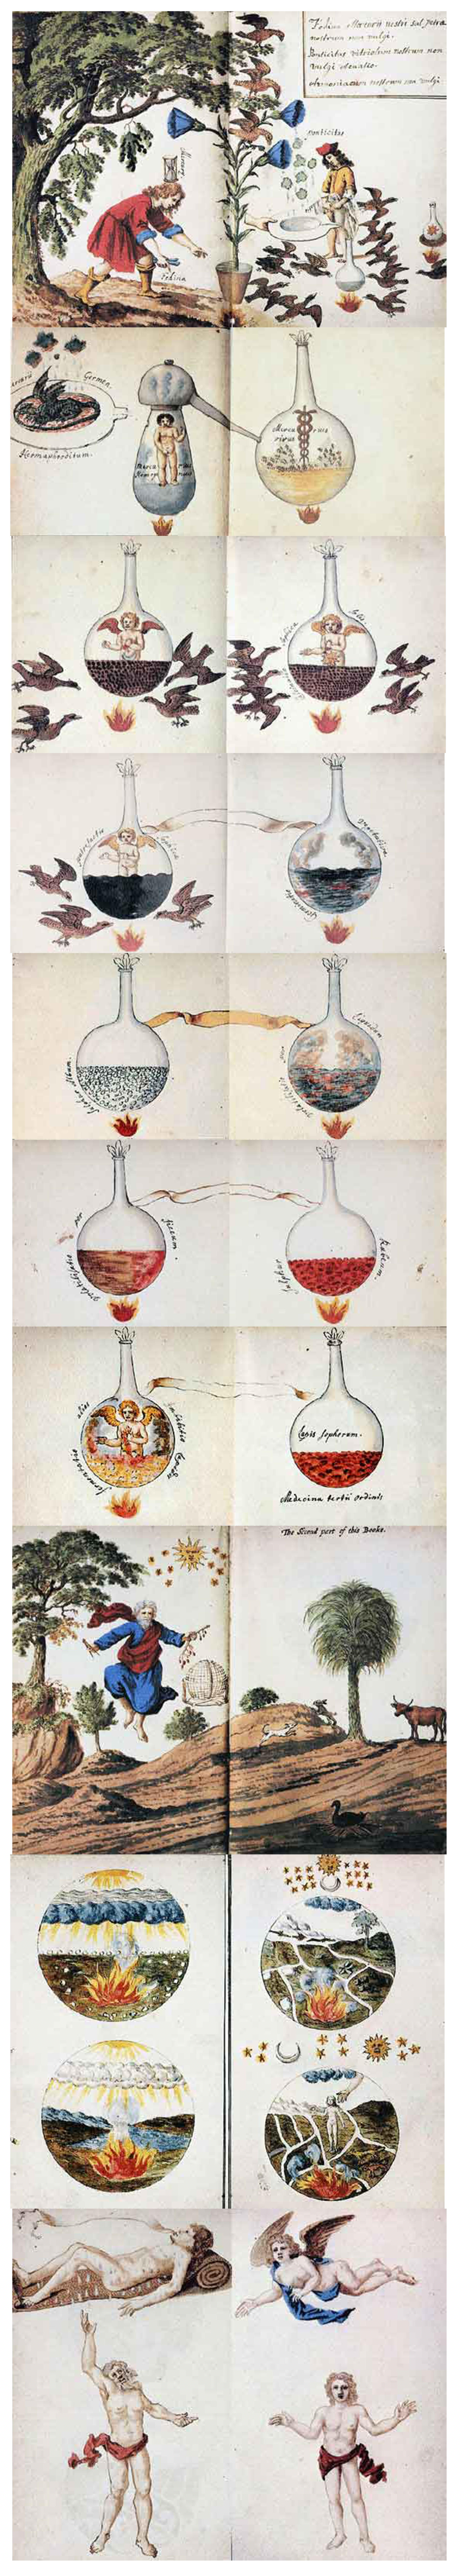 Alchemy recipe Meta FreeBook